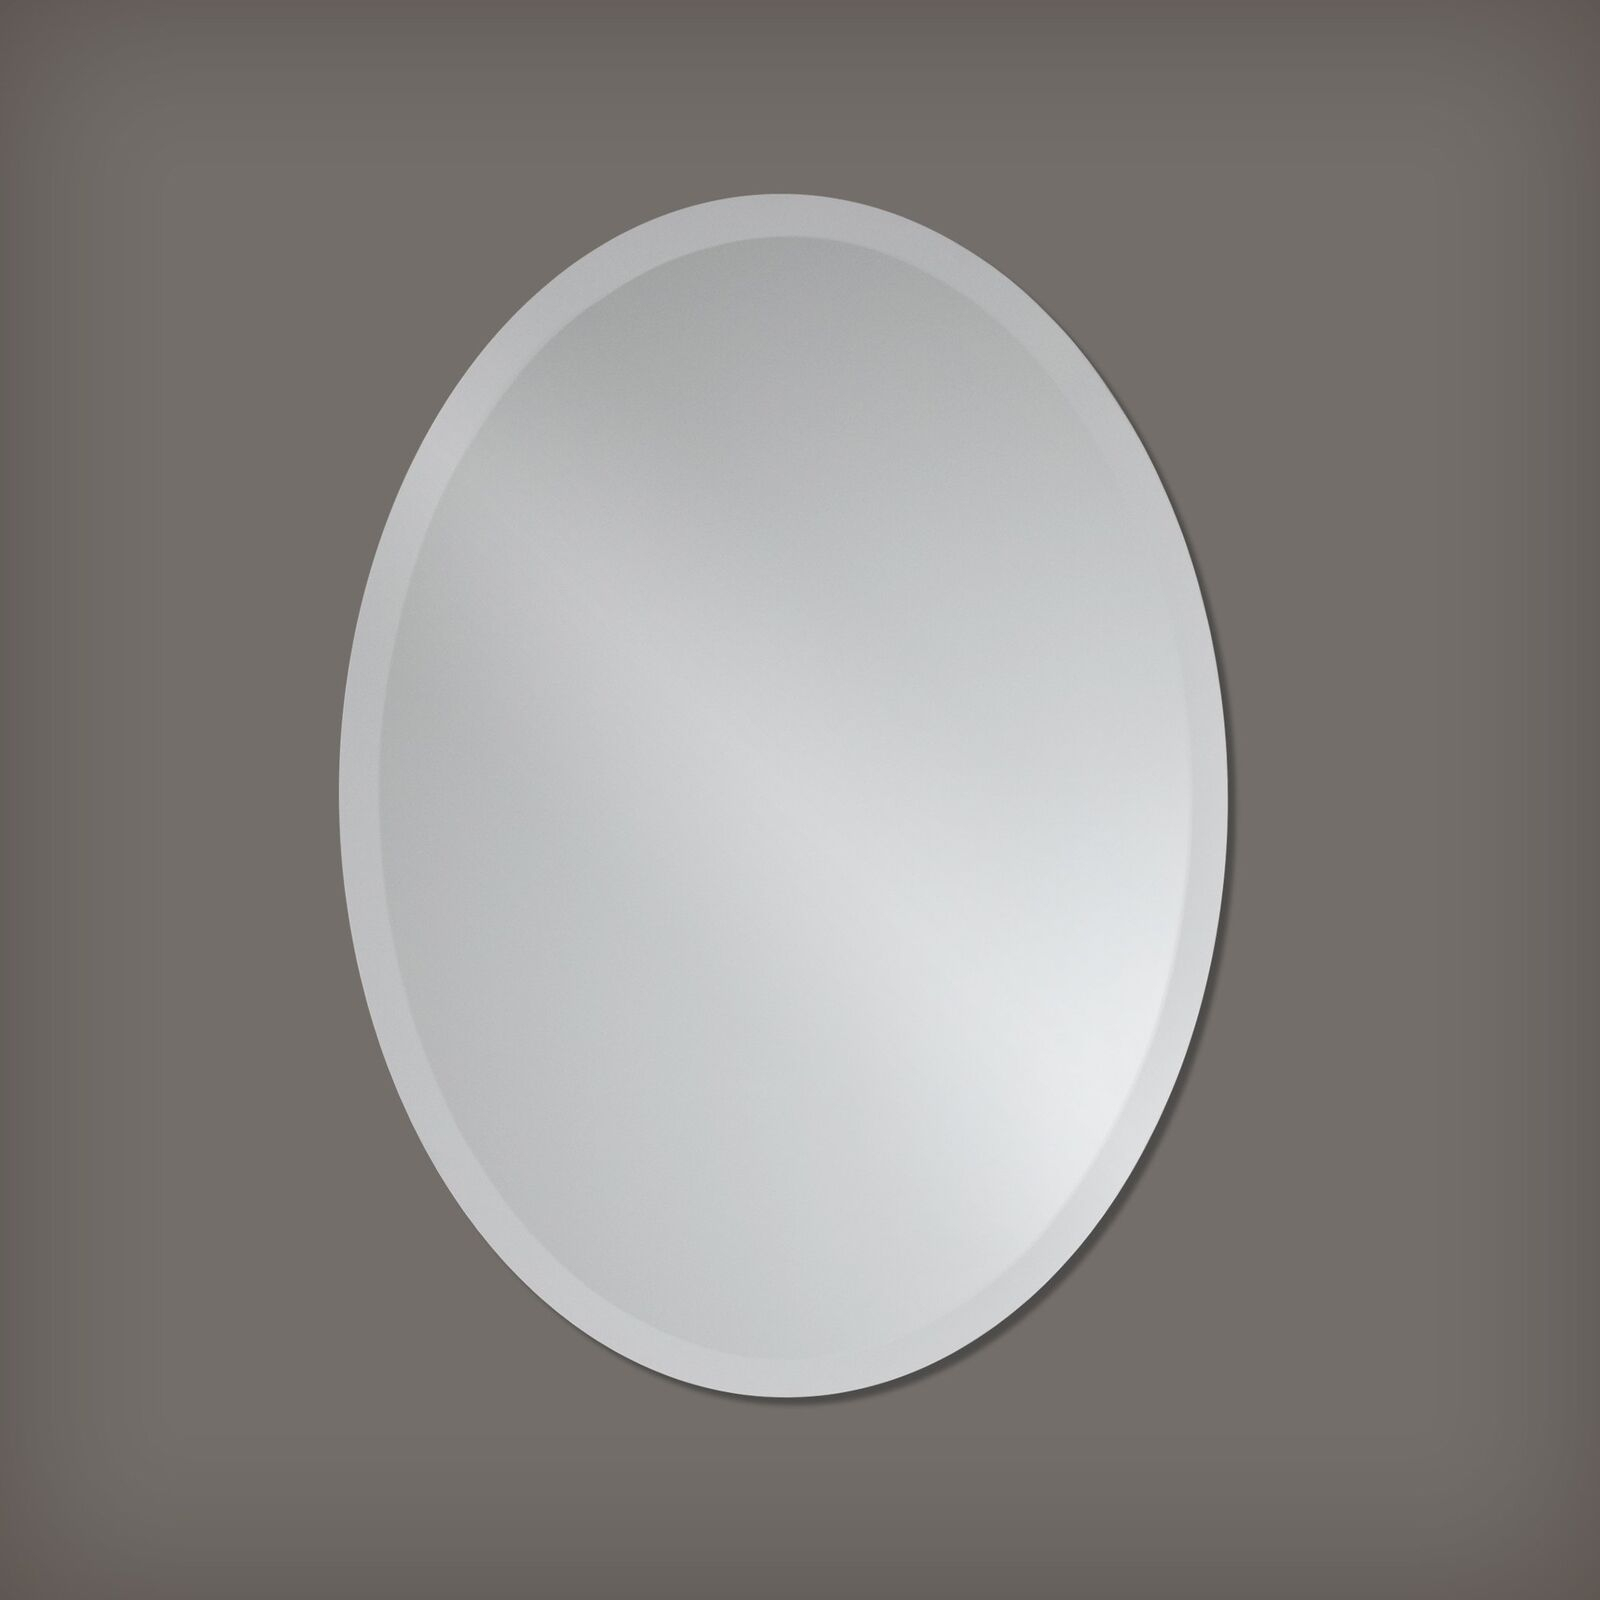 Small Frameless Beveled Oval Wall Mirror Bathroom, Vanity, For Thornbury Oval Bevel Frameless Wall Mirrors (Image 16 of 20)